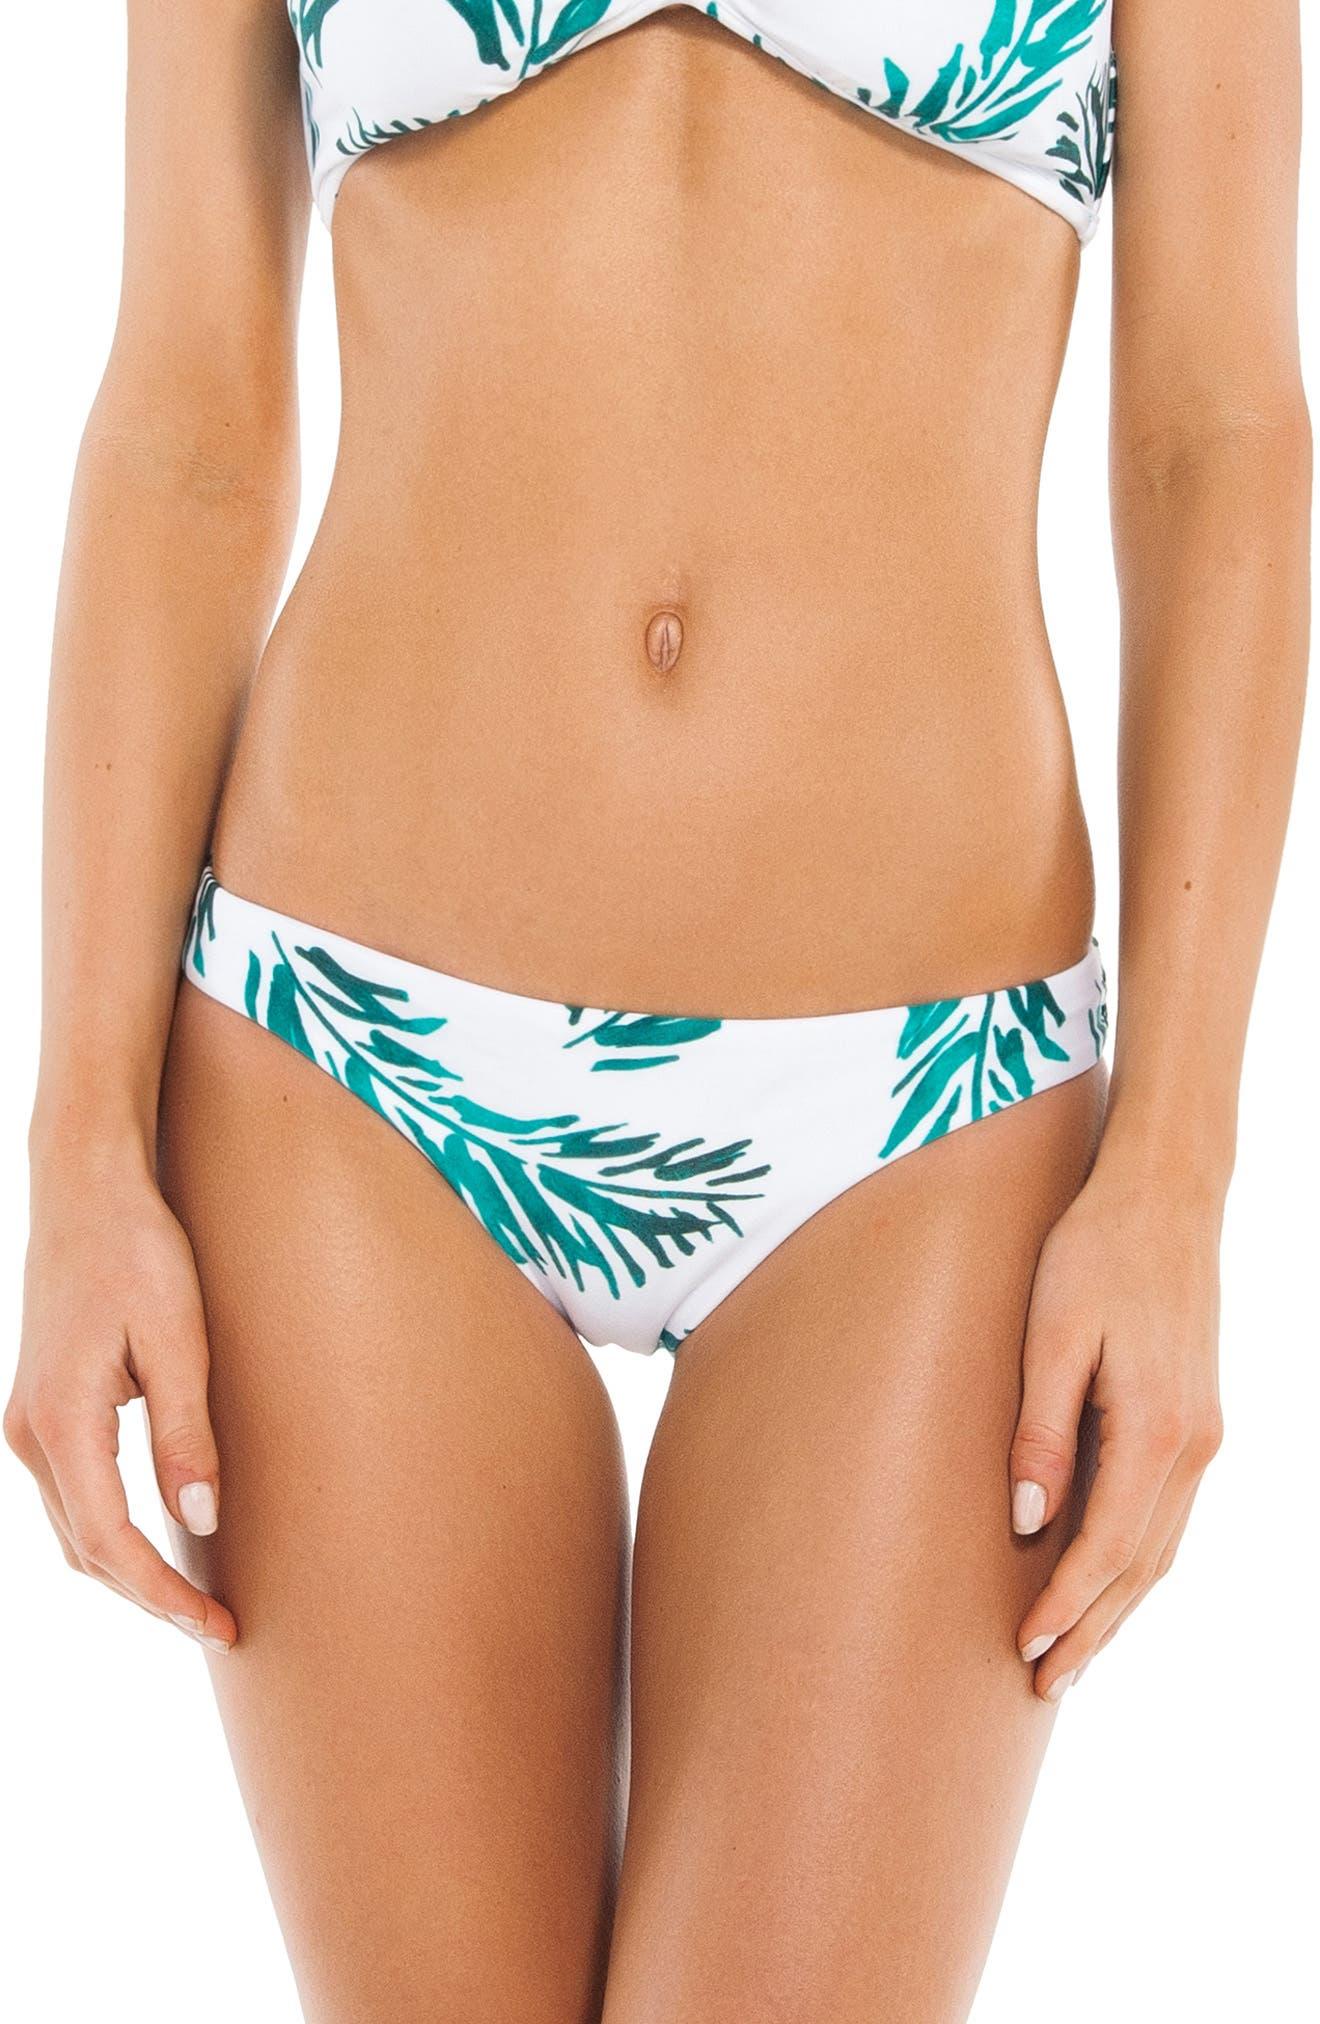 Tulum Print Bikini Bottoms,                         Main,                         color, 100